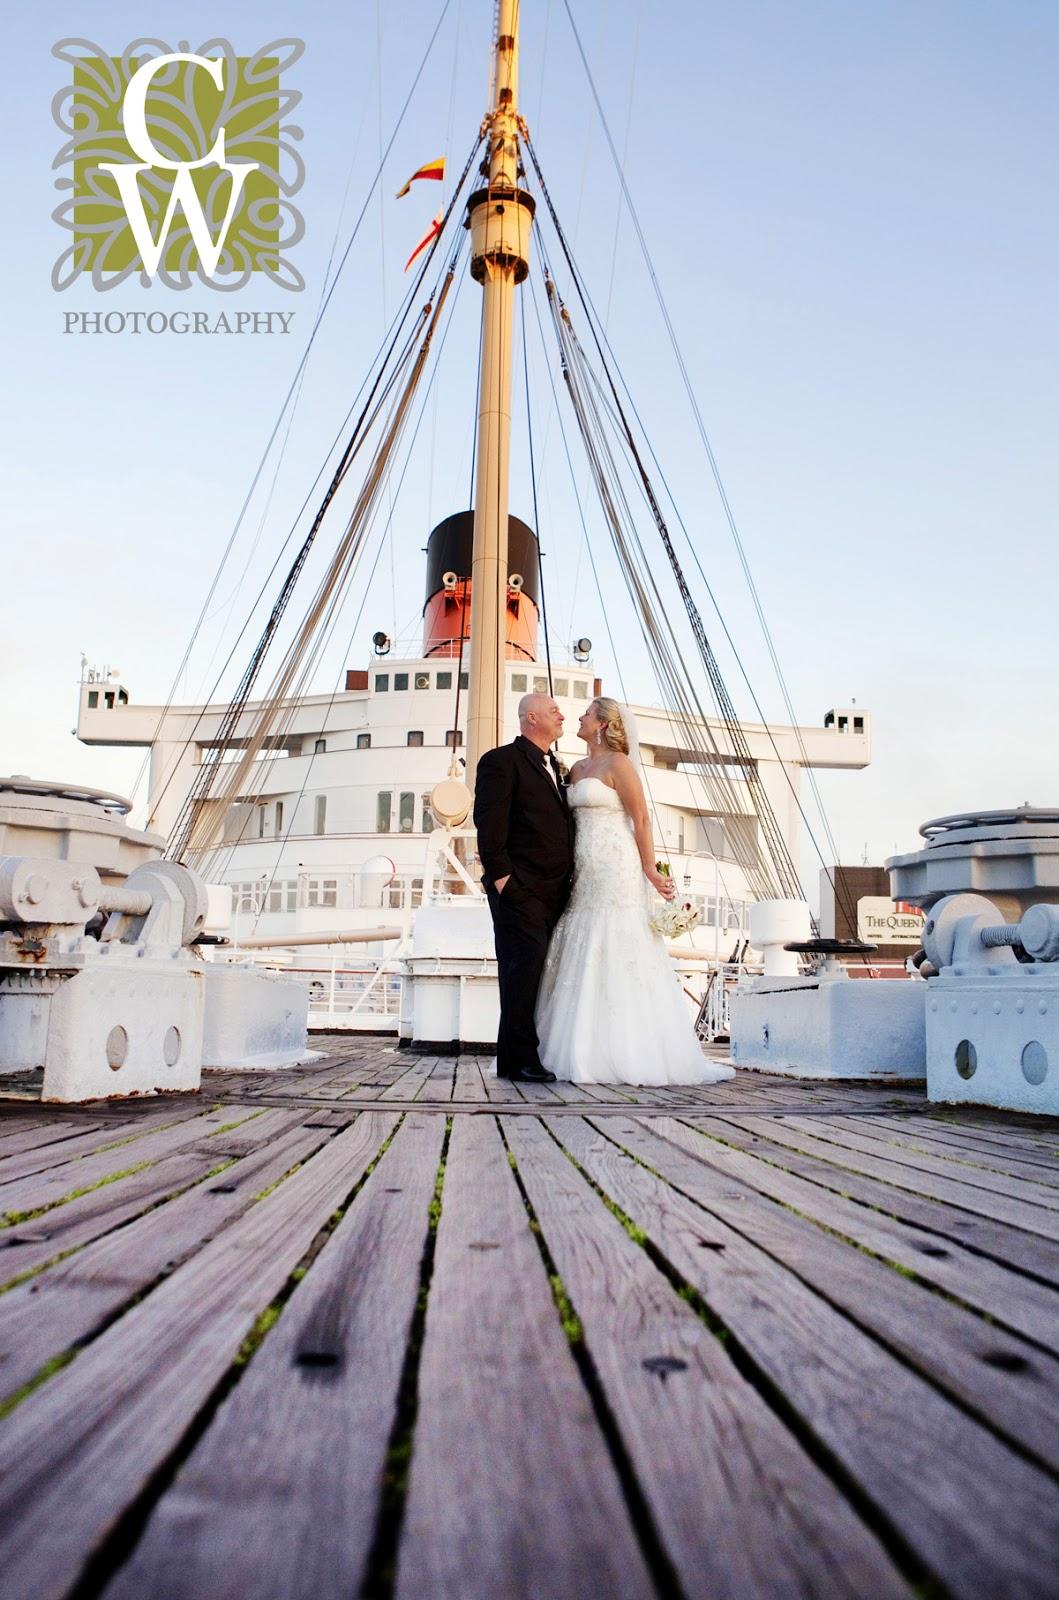 South Beach Queen Bedroom Set Modern: Wedding Photography At Queen Mary, Long Beach